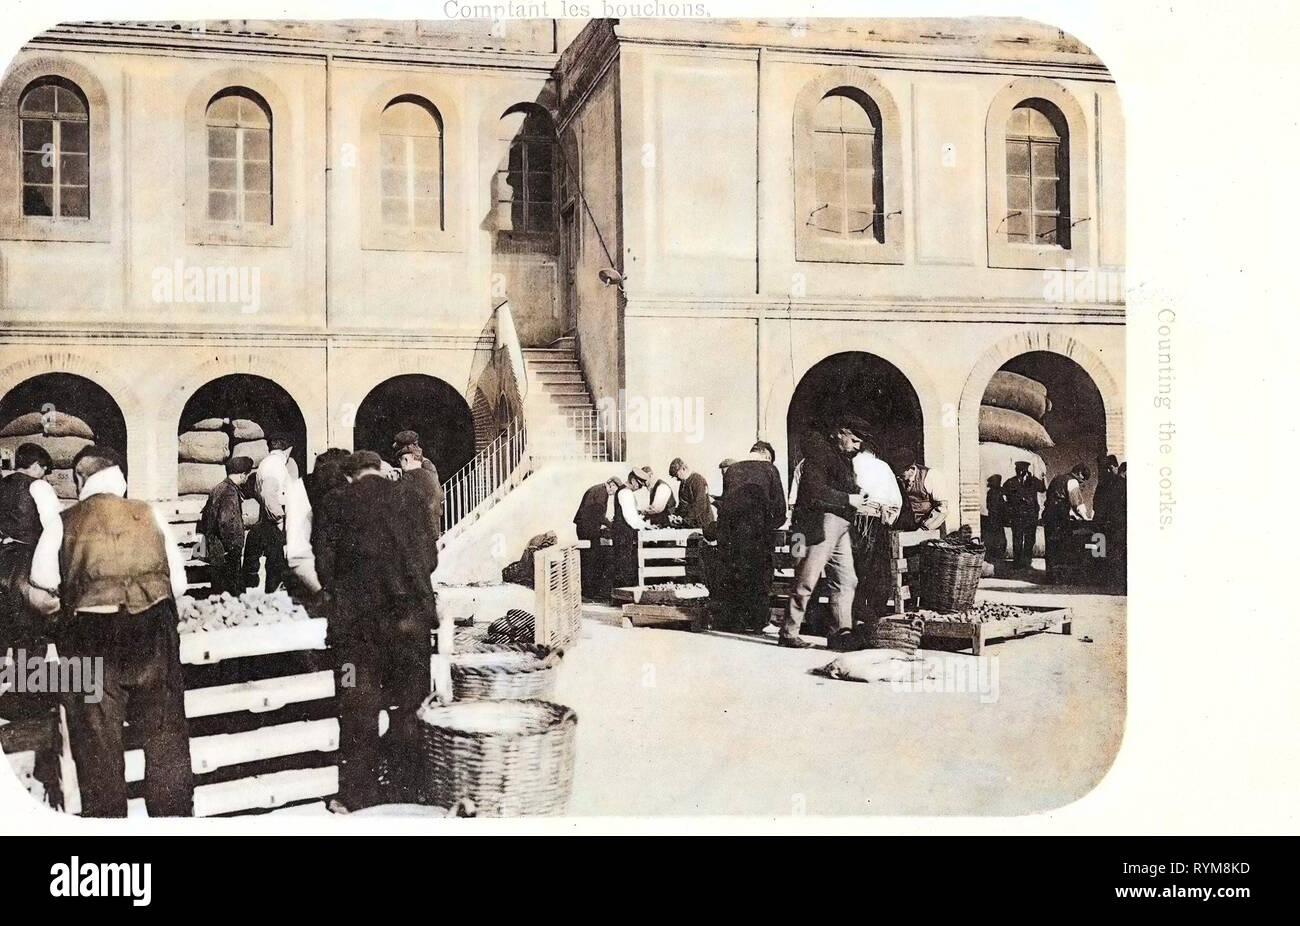 Cork (material), Unidentified locations in Spain, 1903 postcards, 1903, Cortando los tapones, Zählen der Korke - Stock Image